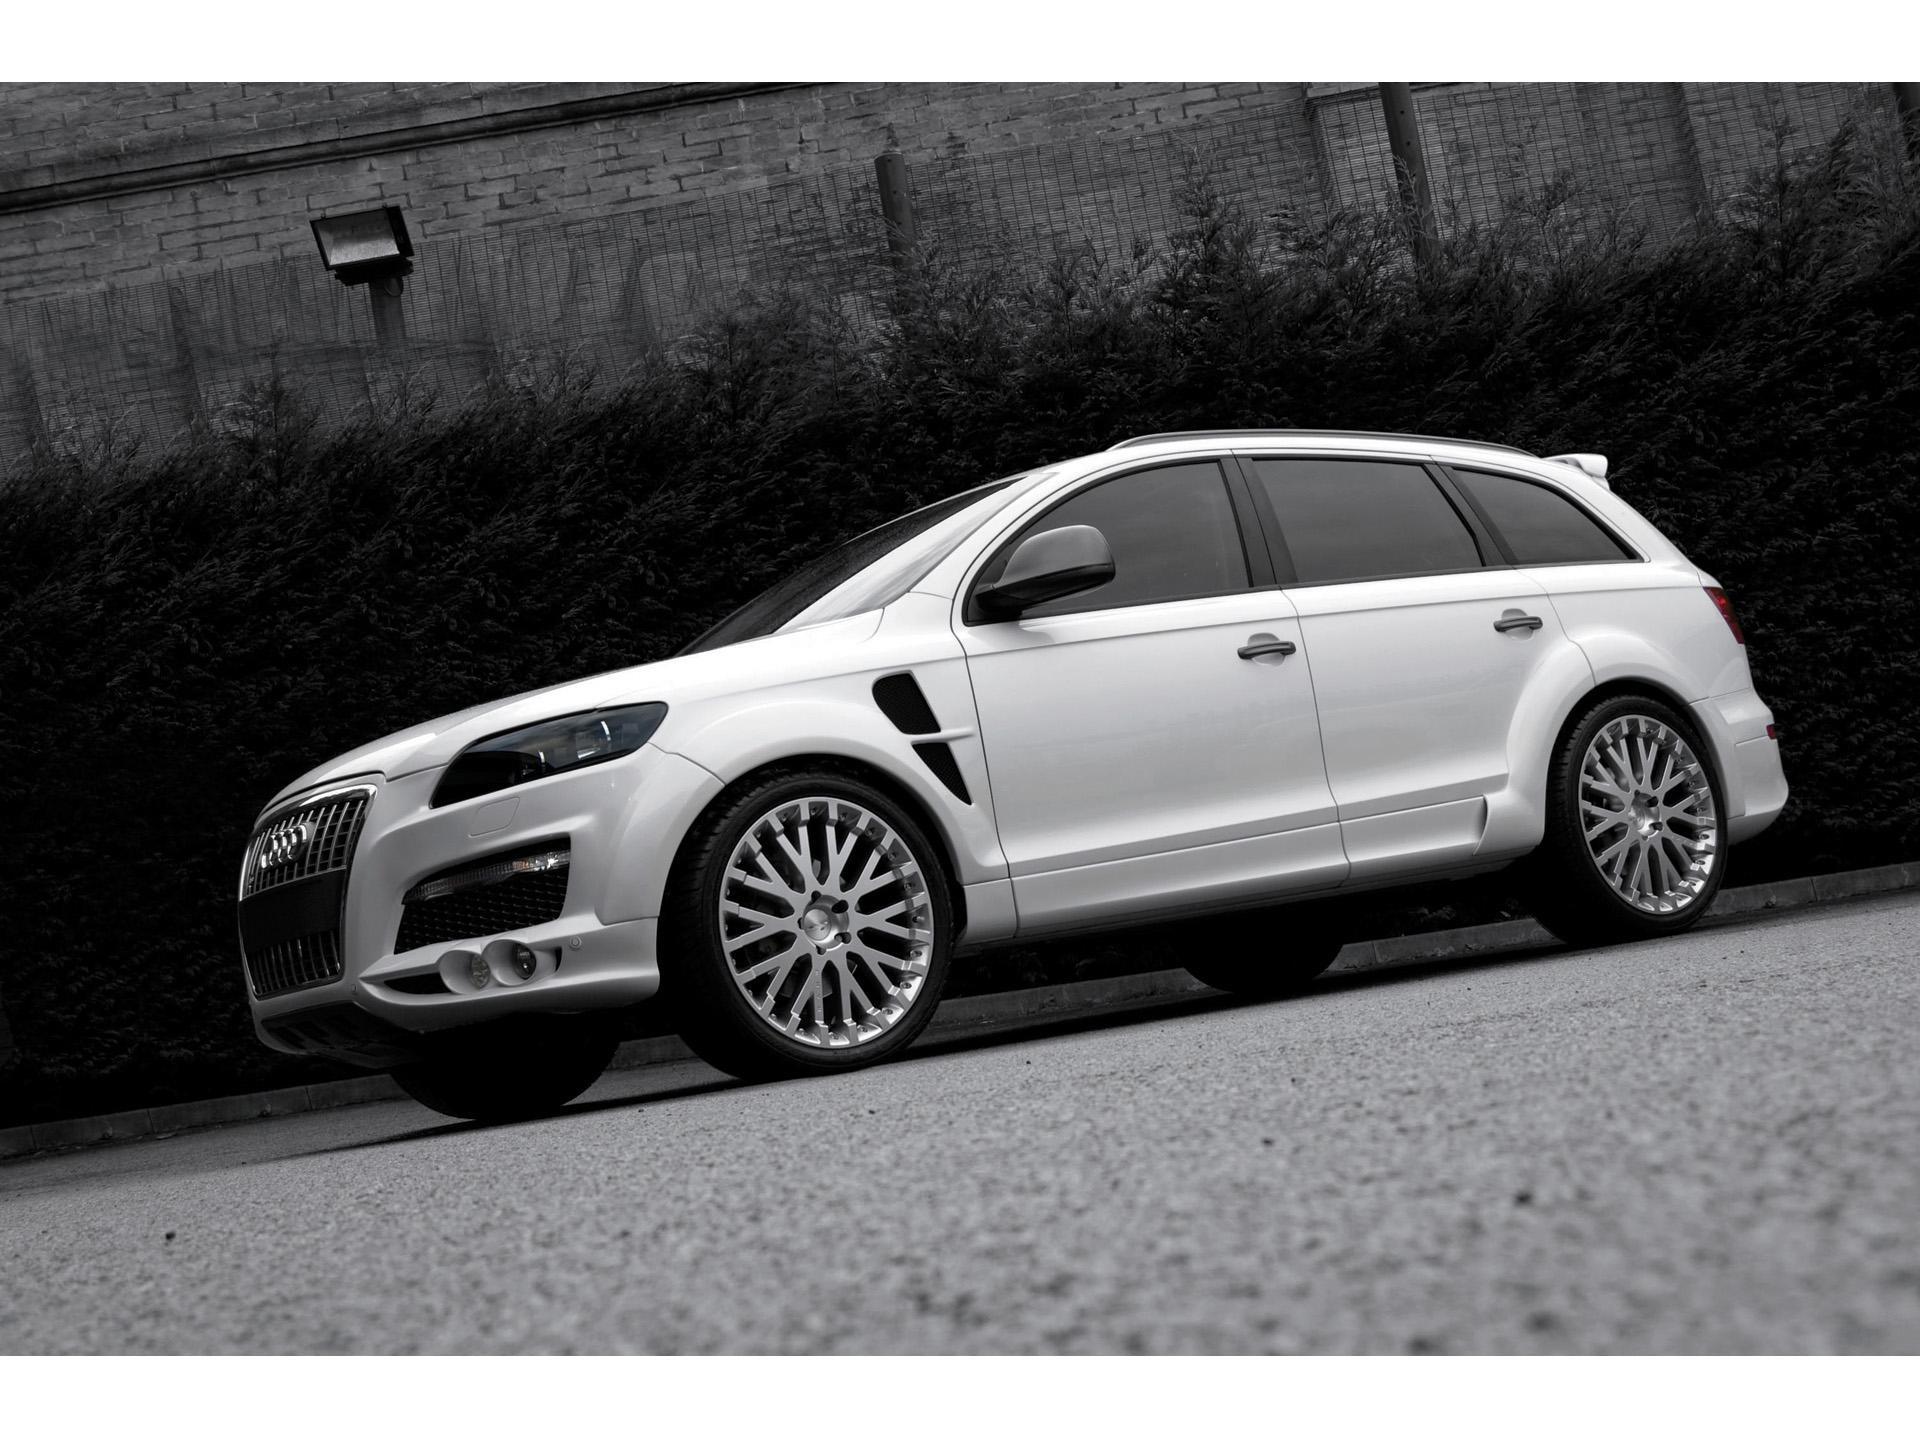 2011 A Kahn Q7 Conceptcarz Audi Headlight Wiring Harness